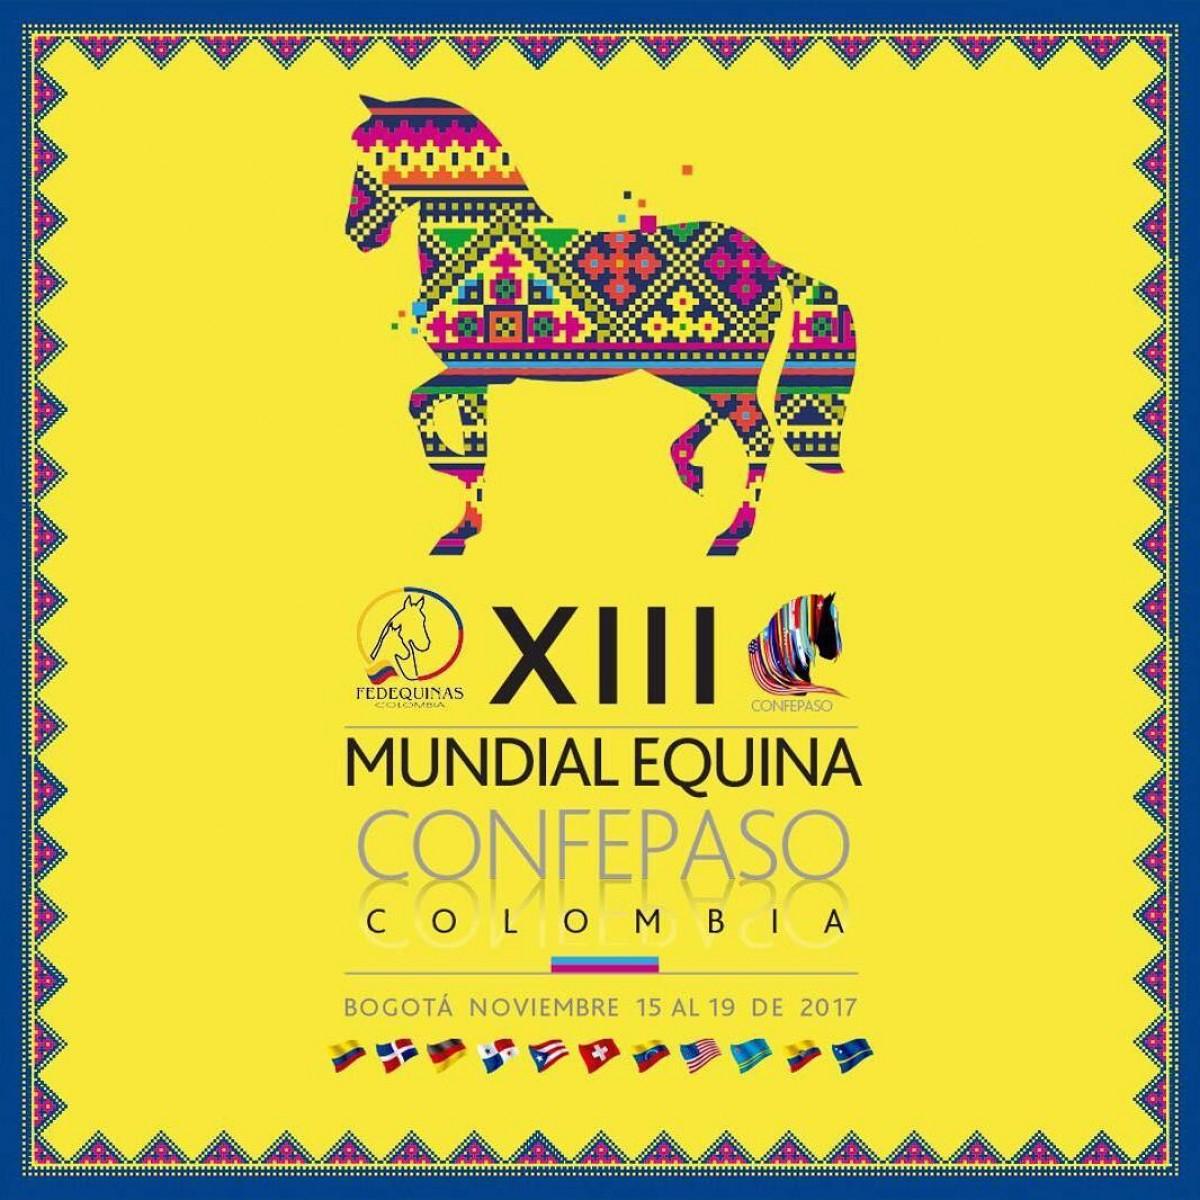 PROGRAMACIÓN XIII MUNDIAL EQUINA CONFEPASO 2017